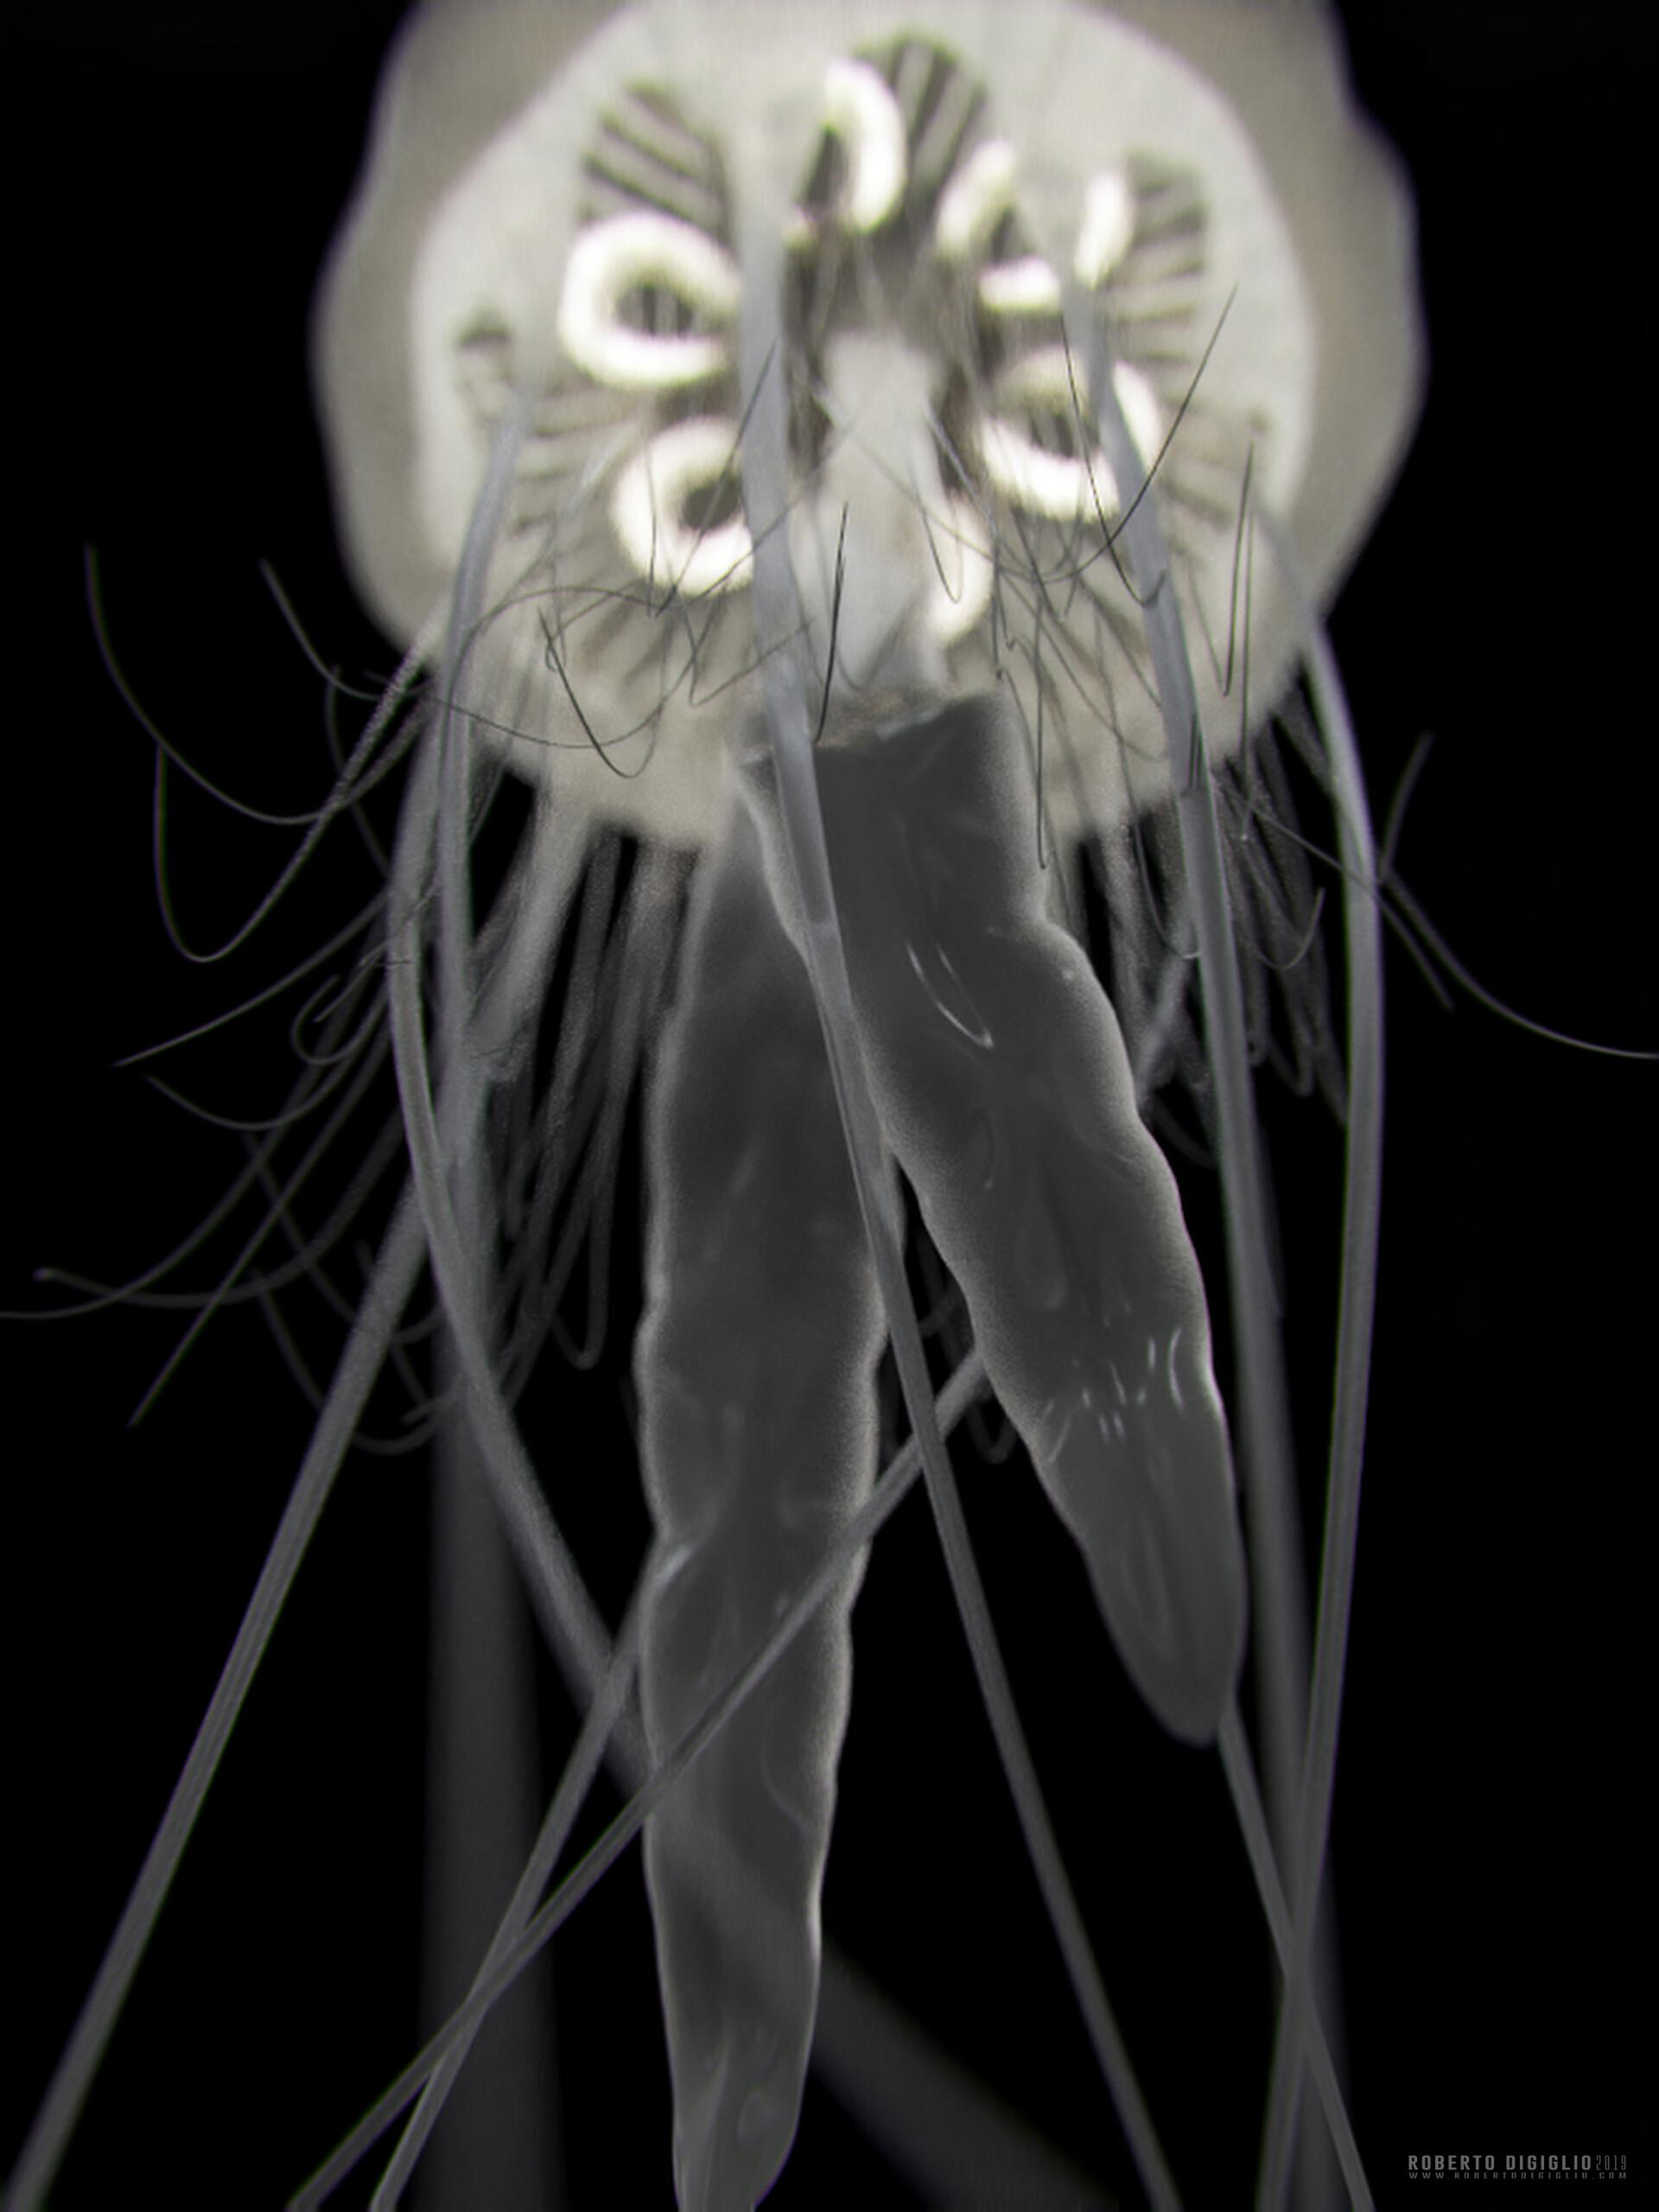 Roberto digiglio jellyfish5